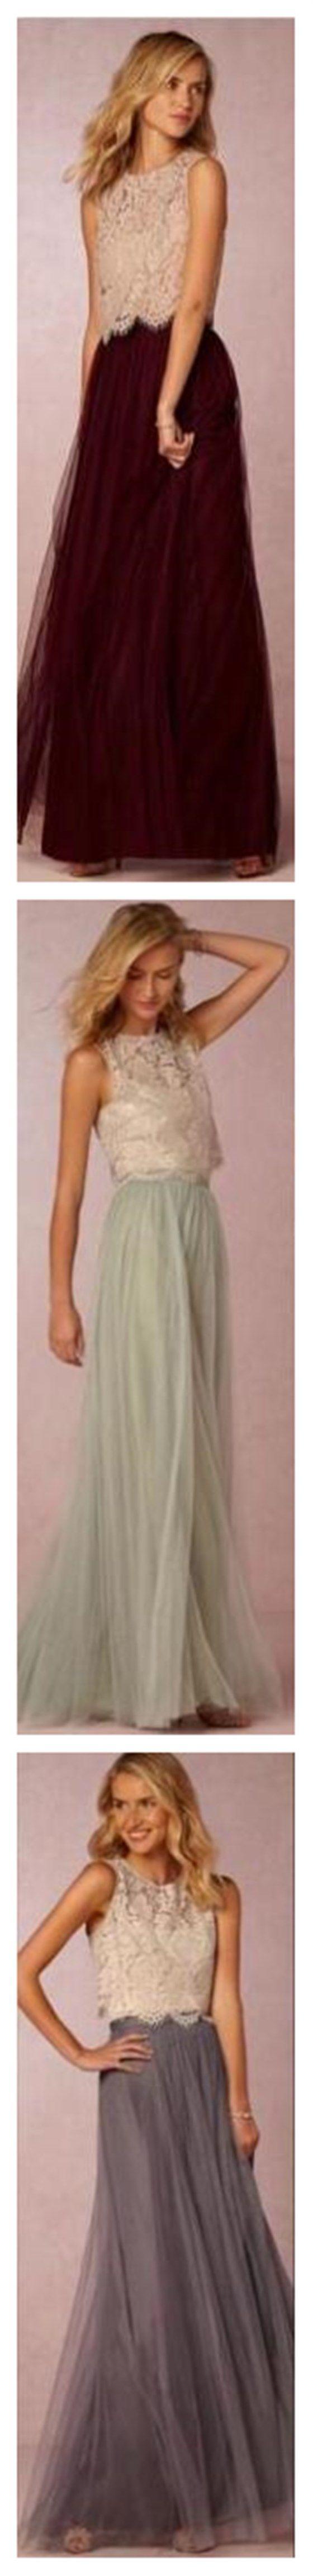 Tulle Bridesmaid Dresses,A-line Bri